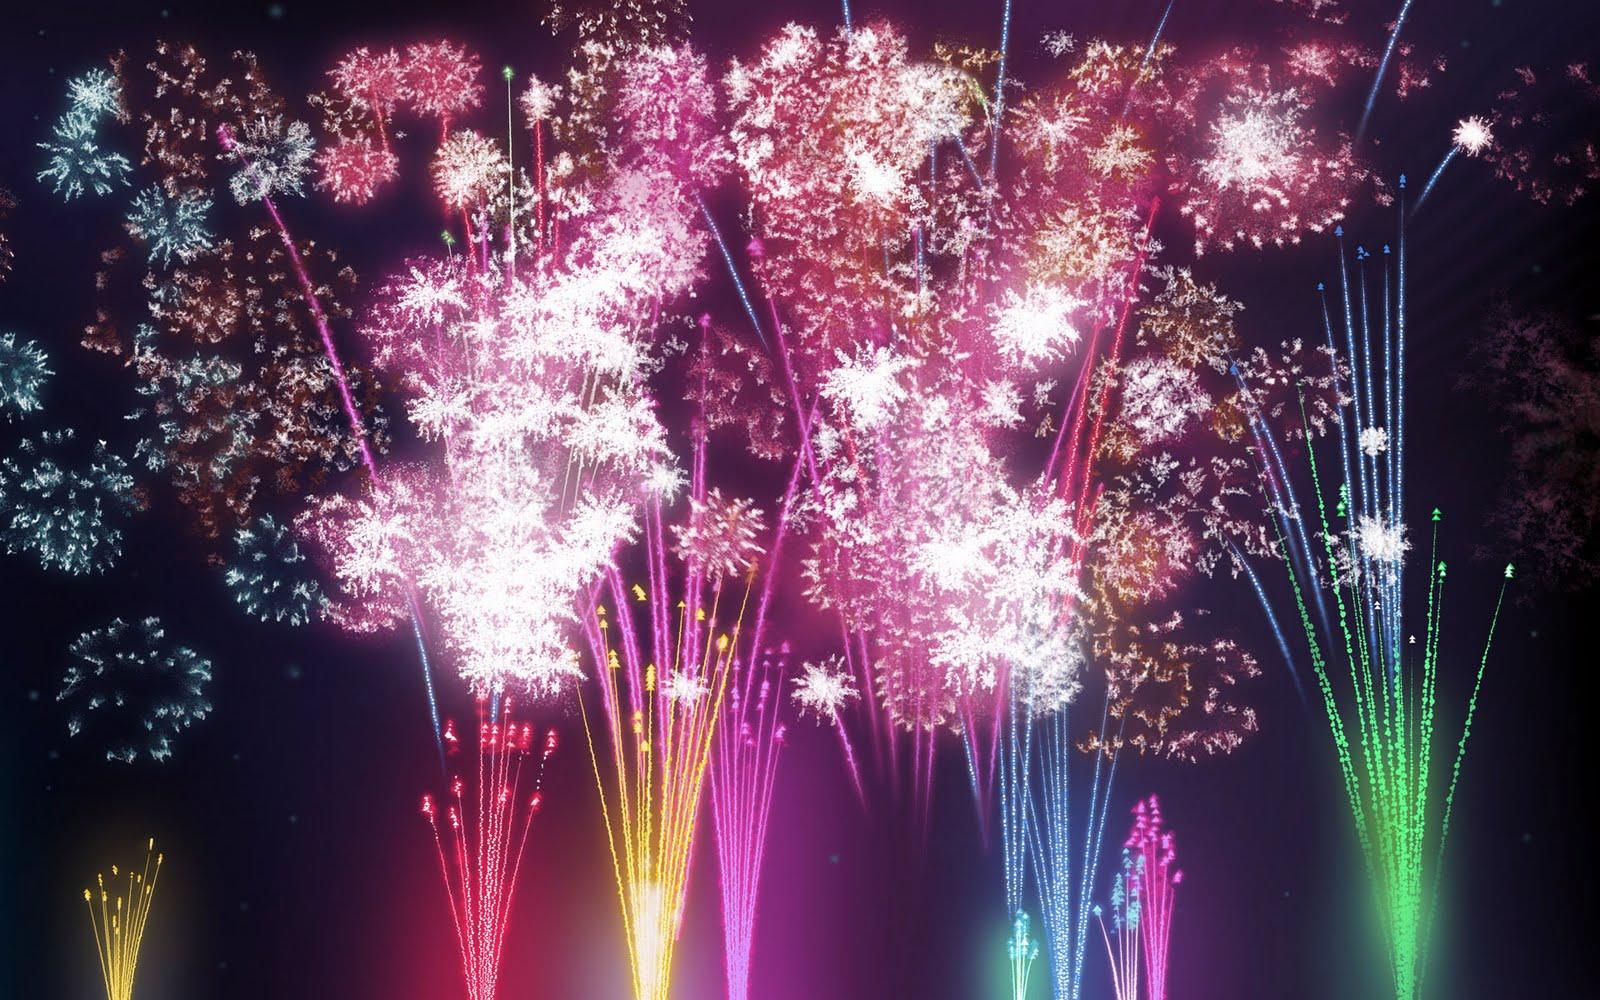 fireworks wallpaperBlue fireworks wallpaperAnimated fireworks 1600x1000